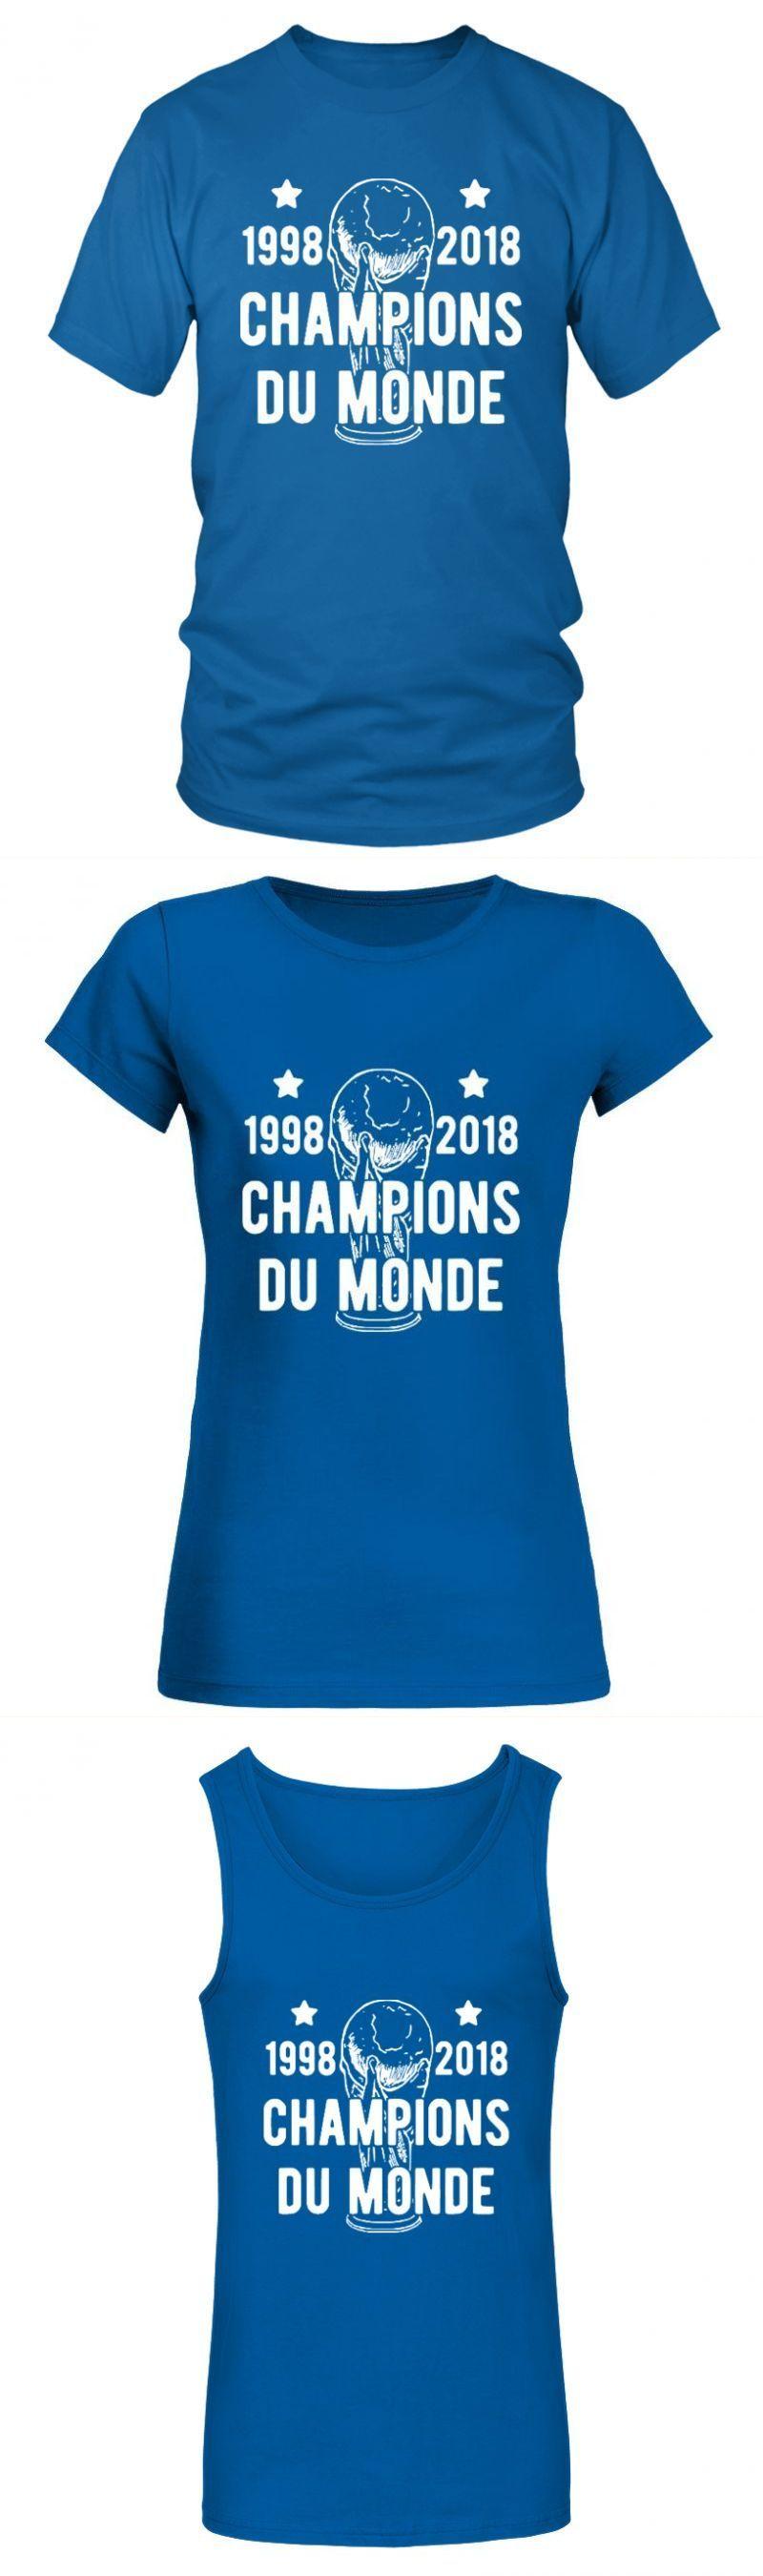 Football Hooligan T Shirt Champions Du Monde 1998 2018 Argentina T